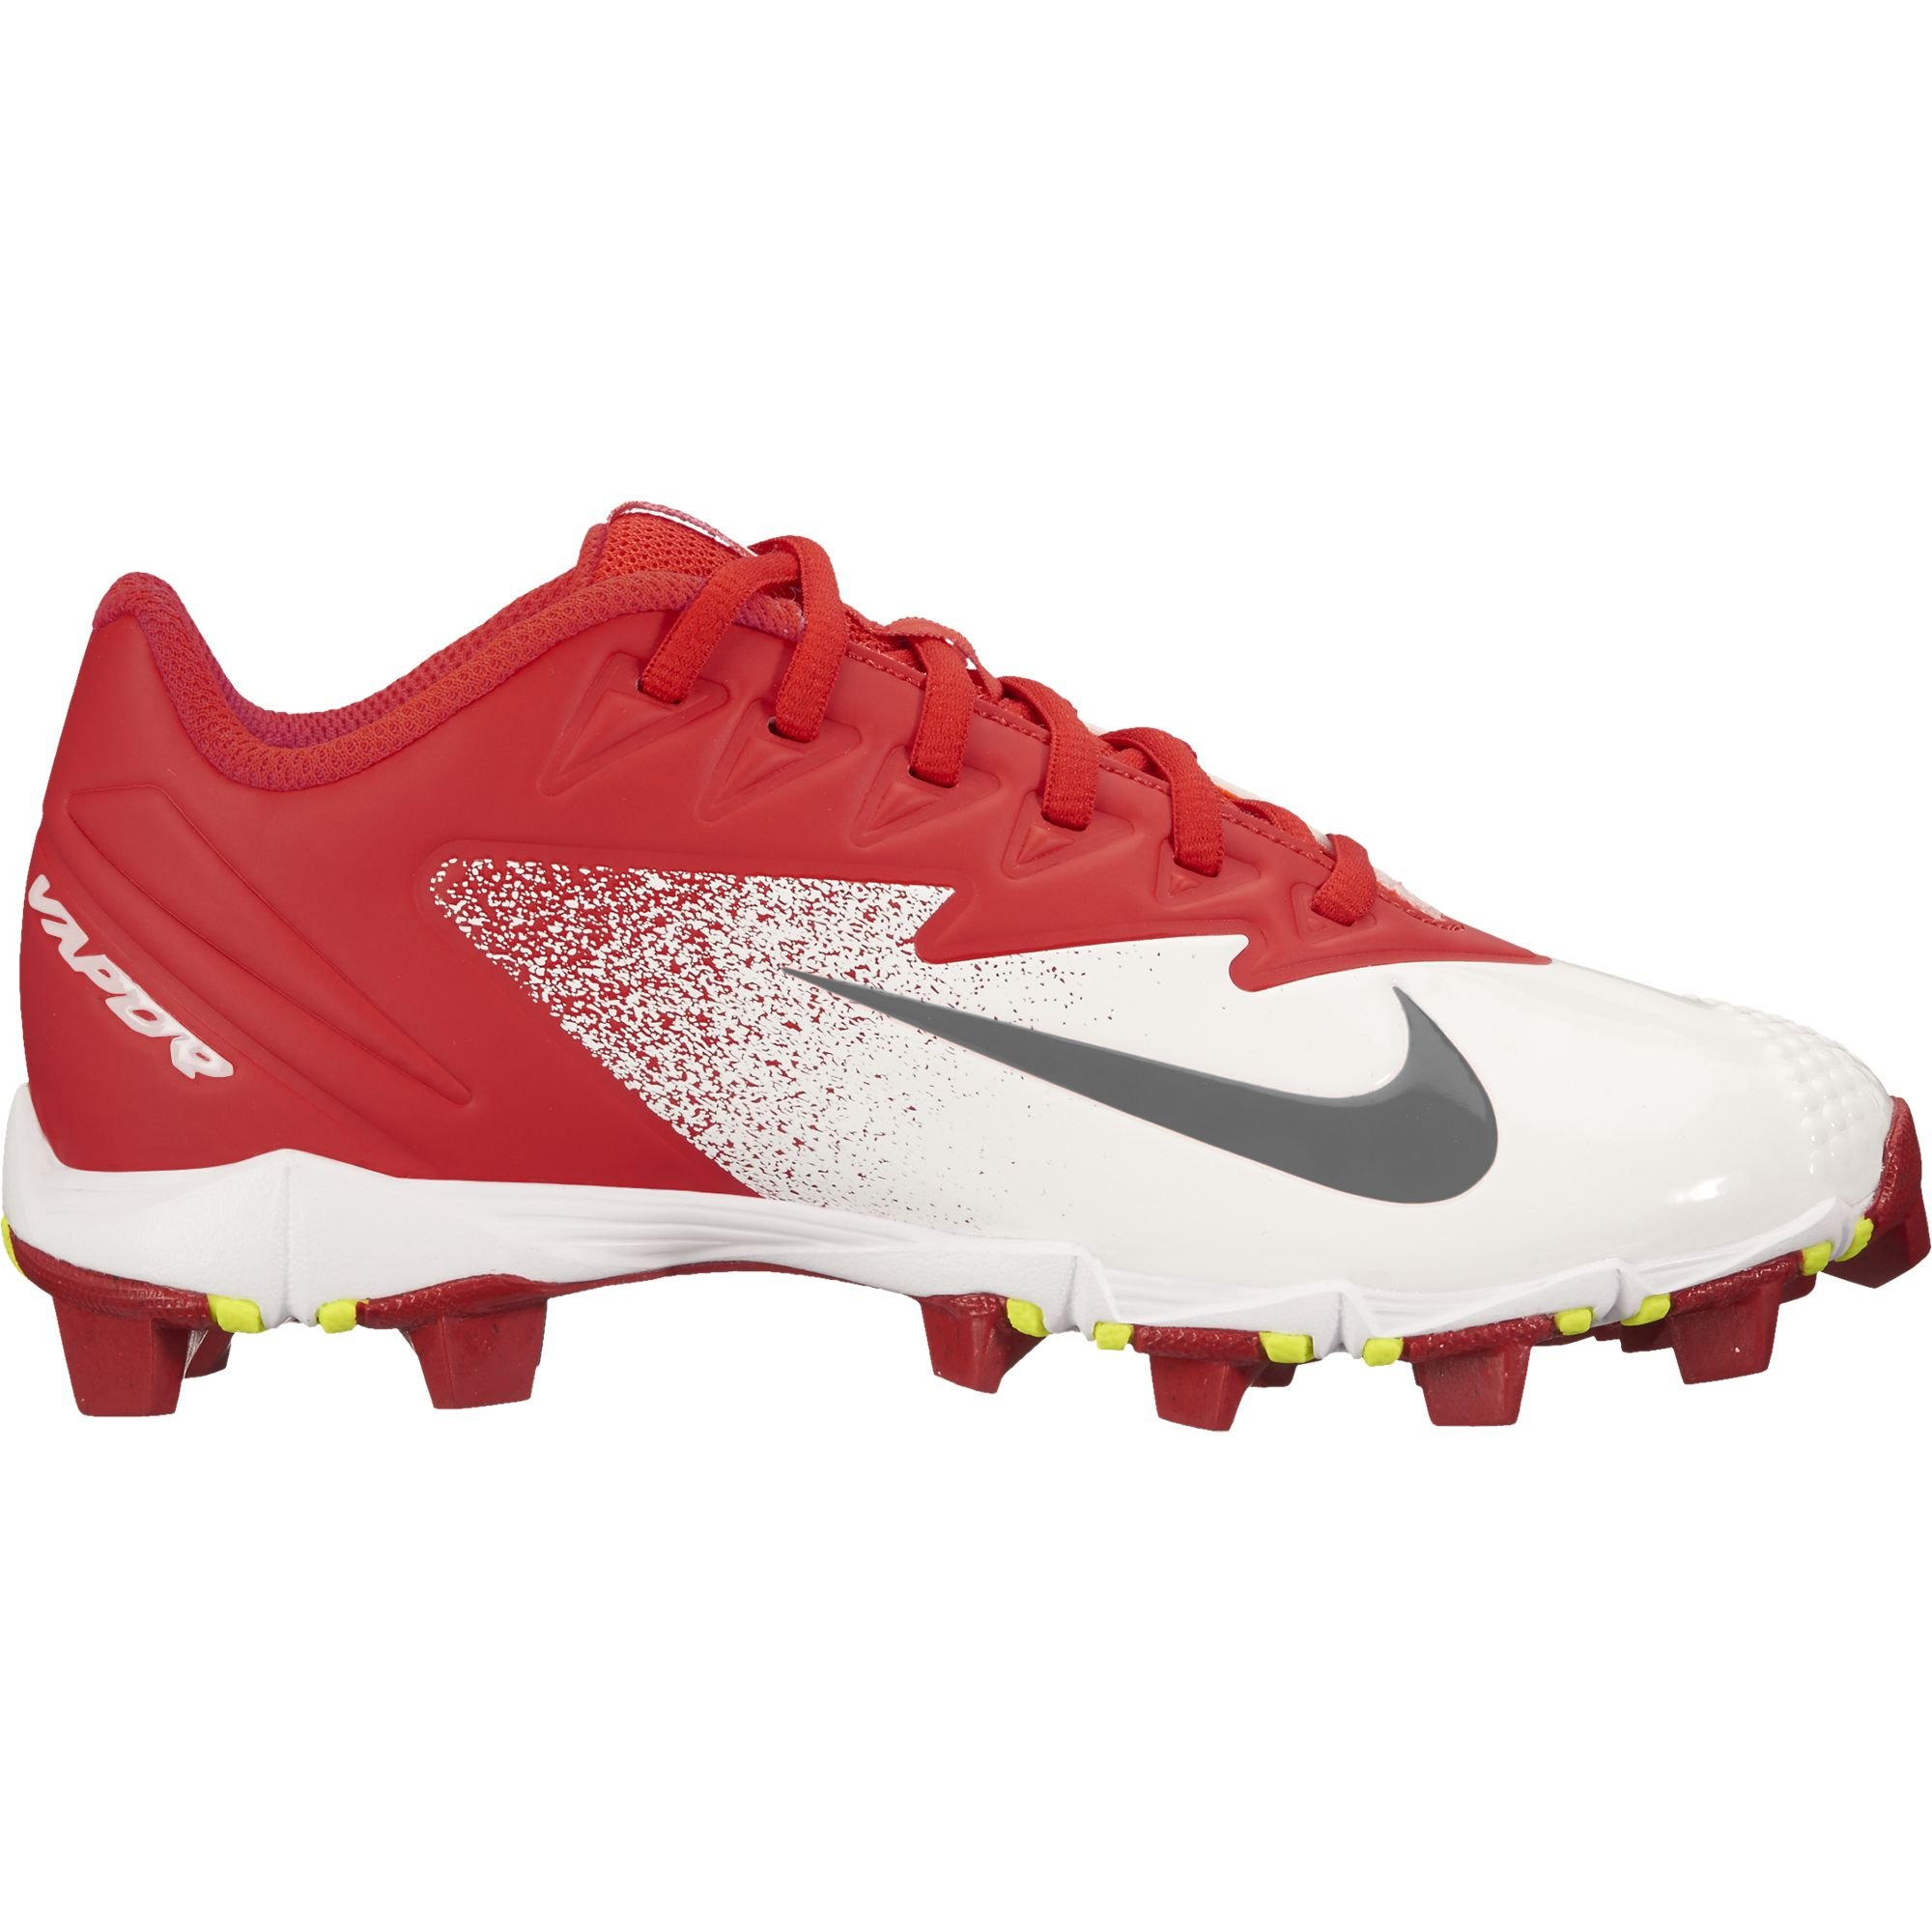 Nike Boy's Vapor Ultrafly Keystone (GS) Baseball Cleat University Red/Bright Crimson/White Size 5.5 M US